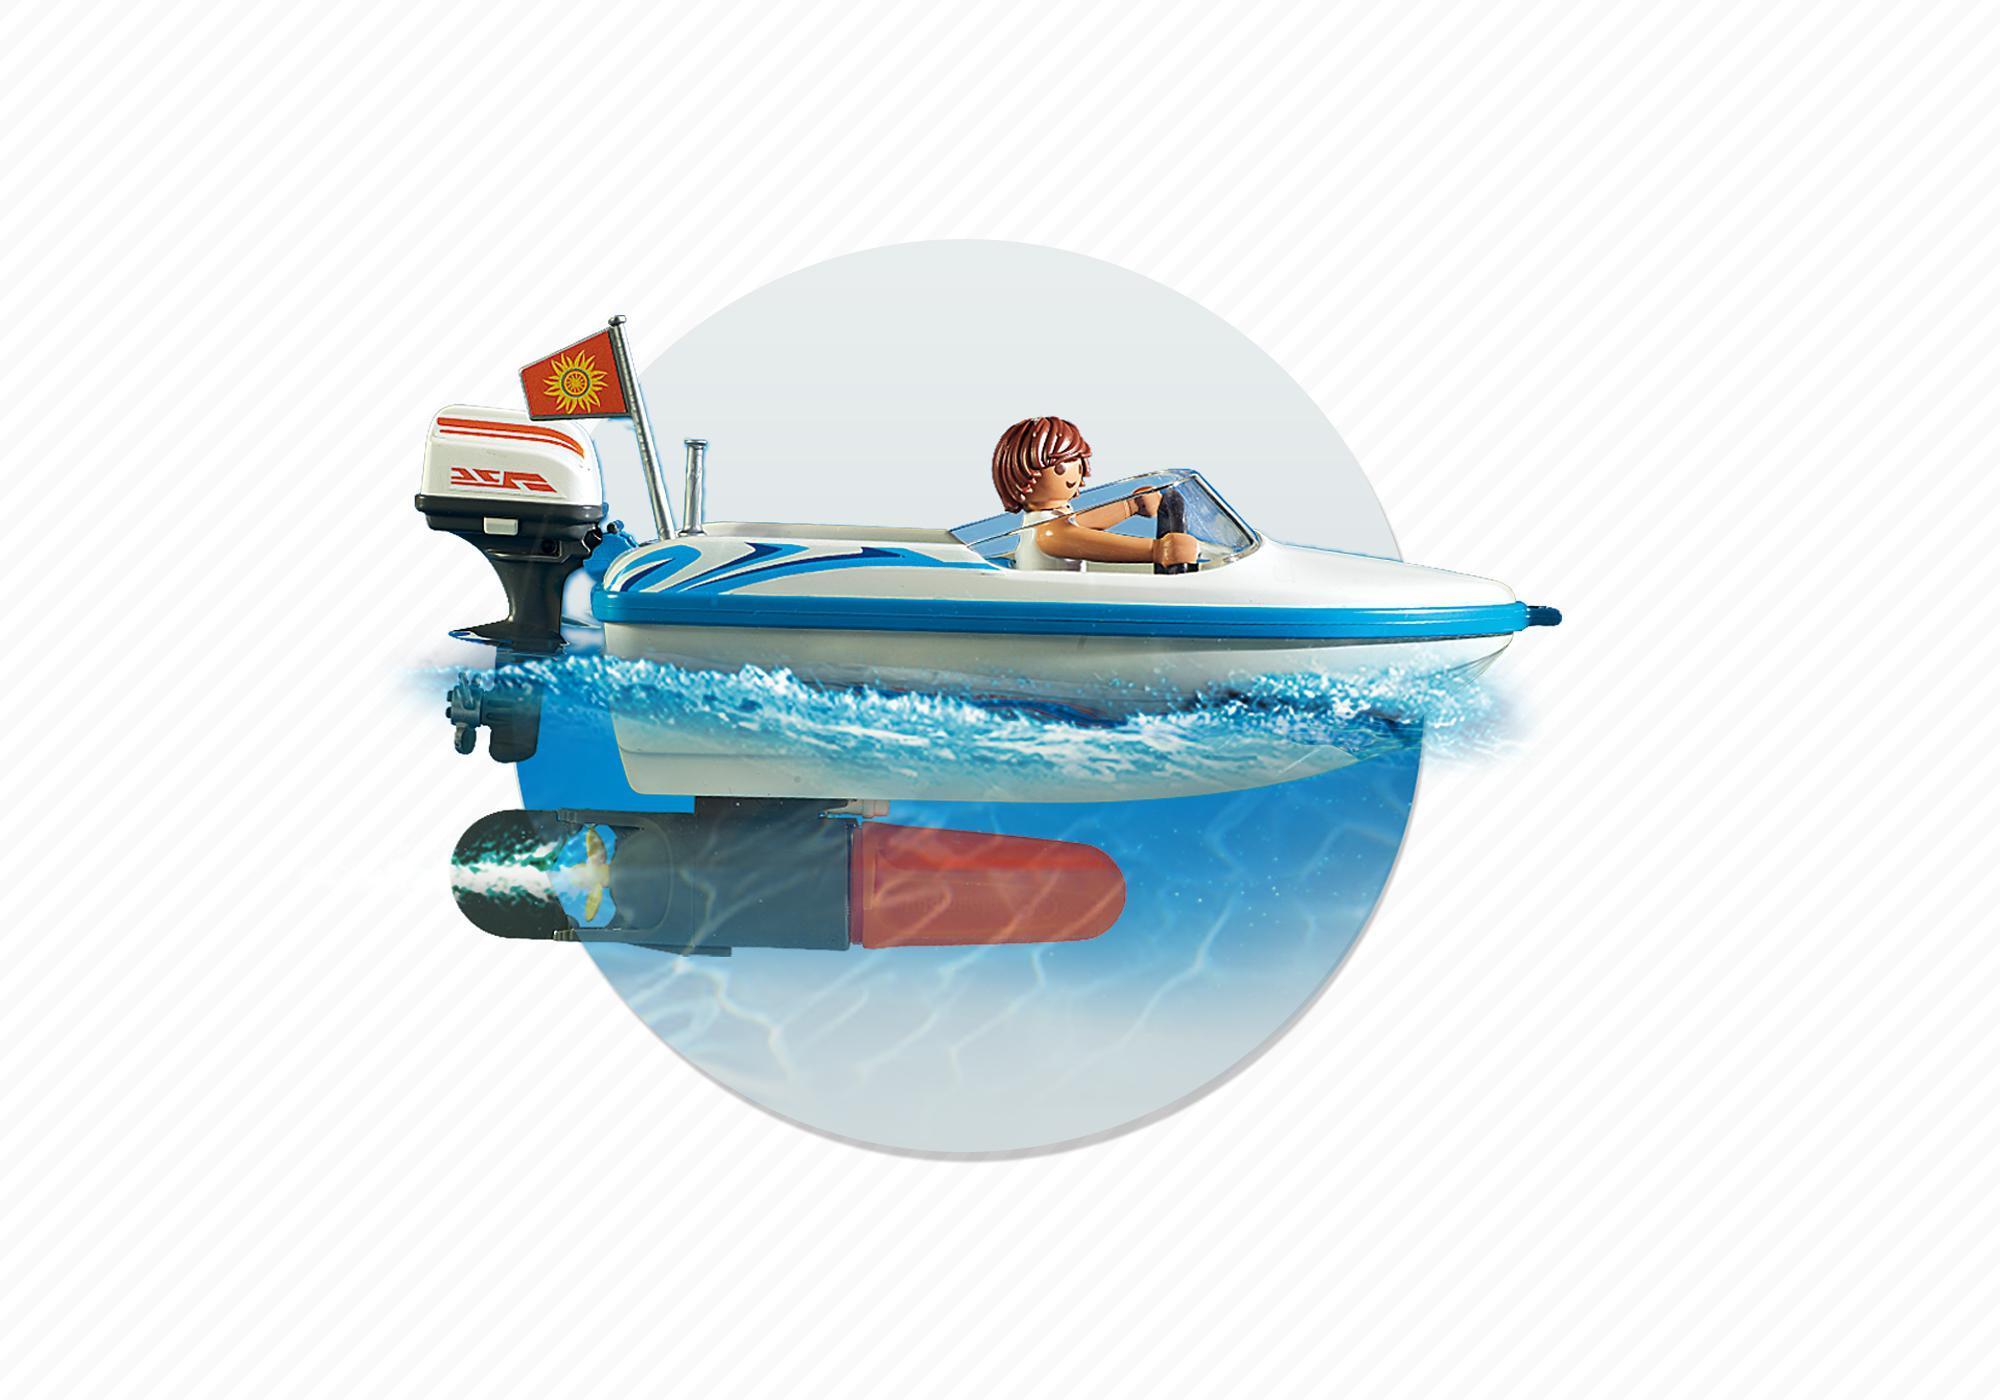 http://media.playmobil.com/i/playmobil/6864_product_extra5/Pick-up met speedboot met onderwatermotor